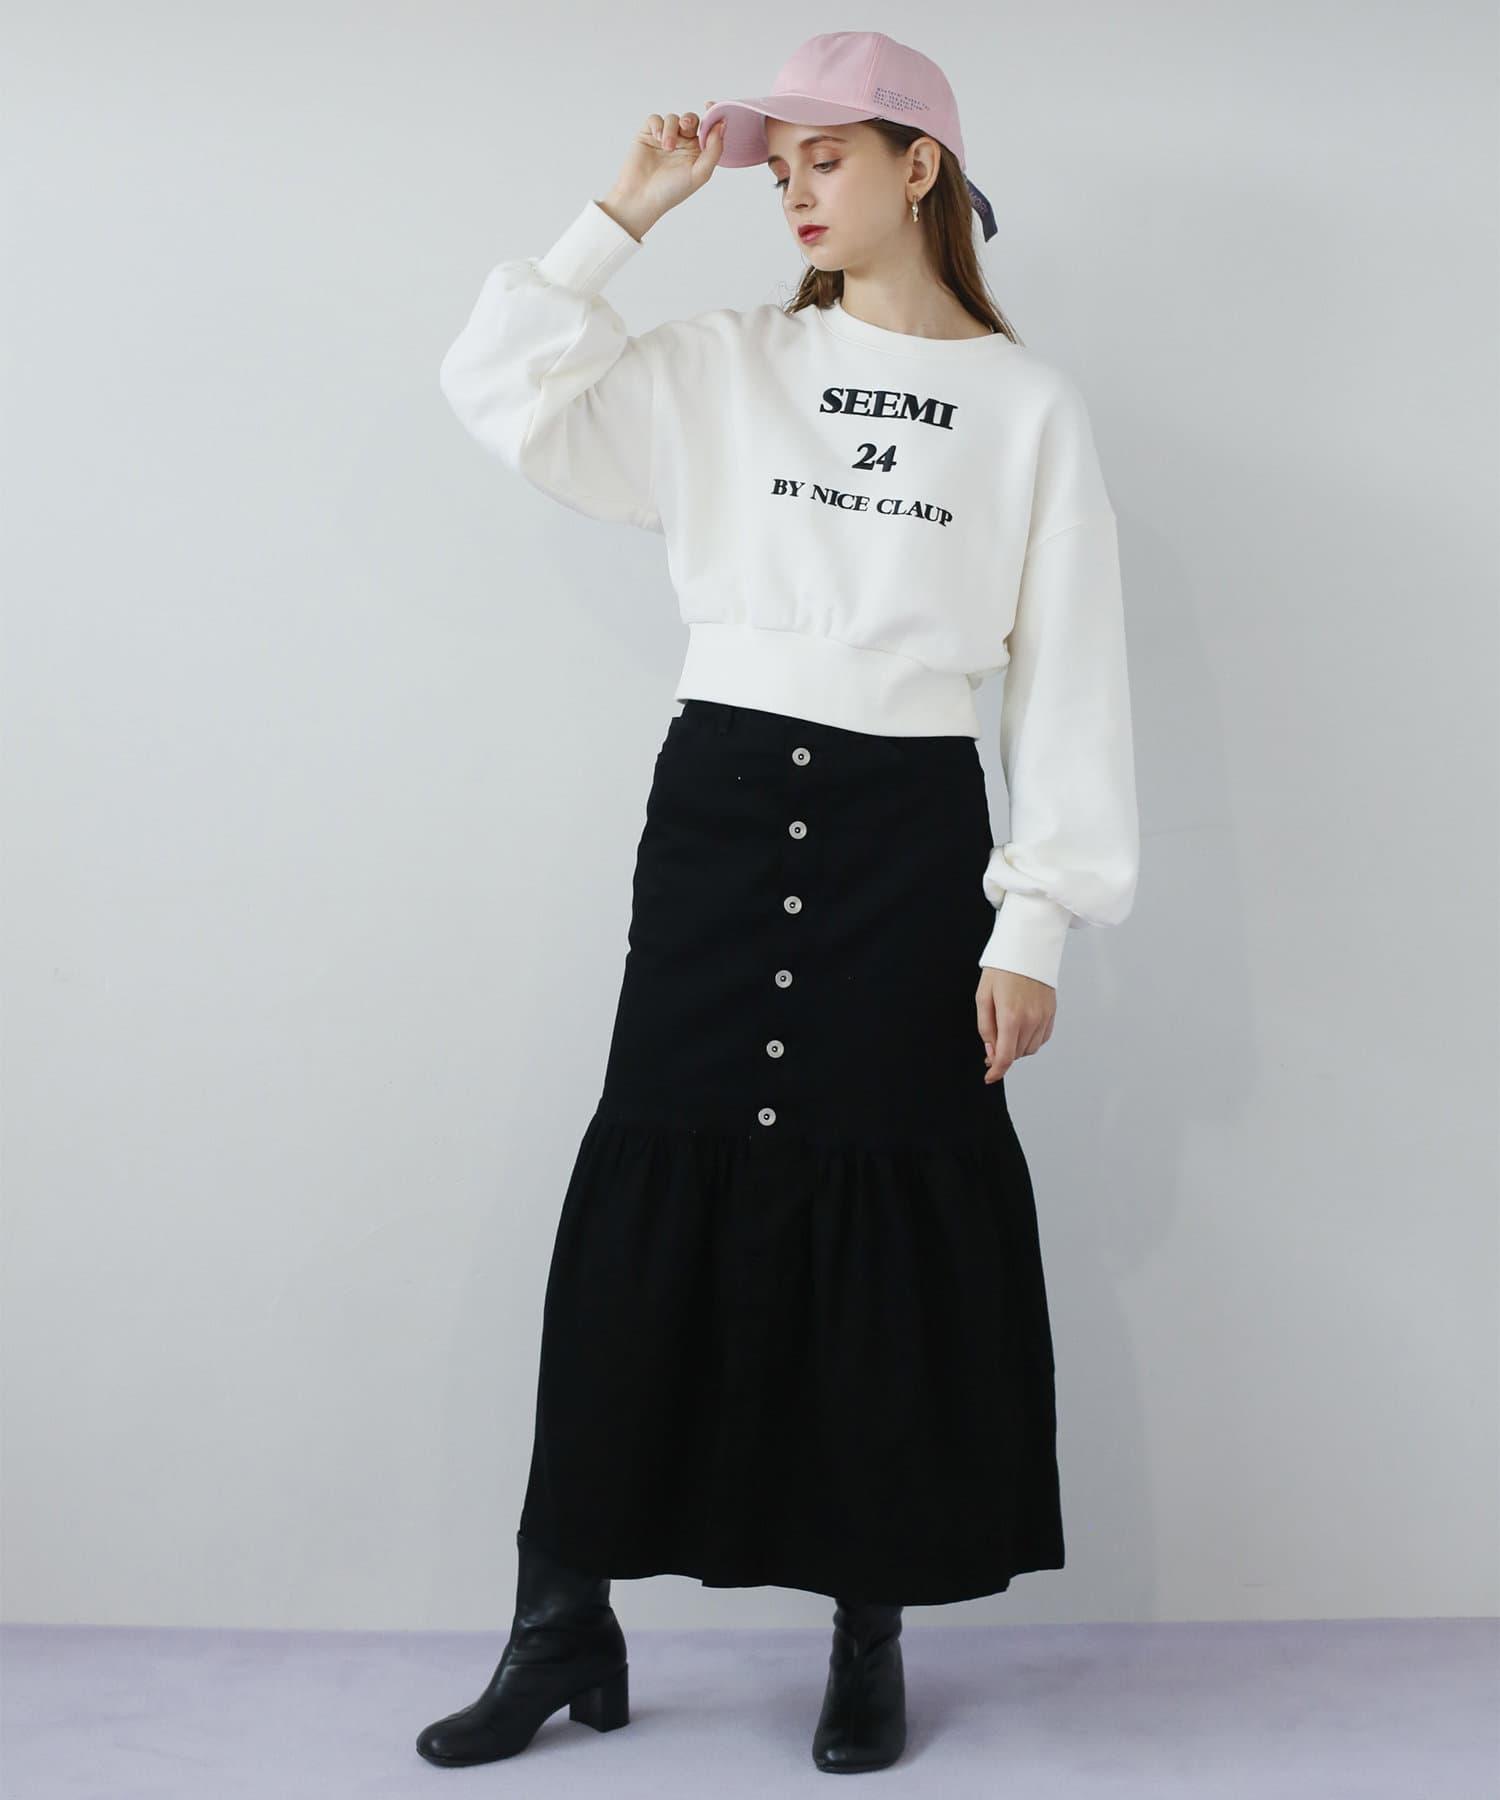 Seemi.by NICE CLAUP(シーミーバイナイスクラップ) デニムスカート